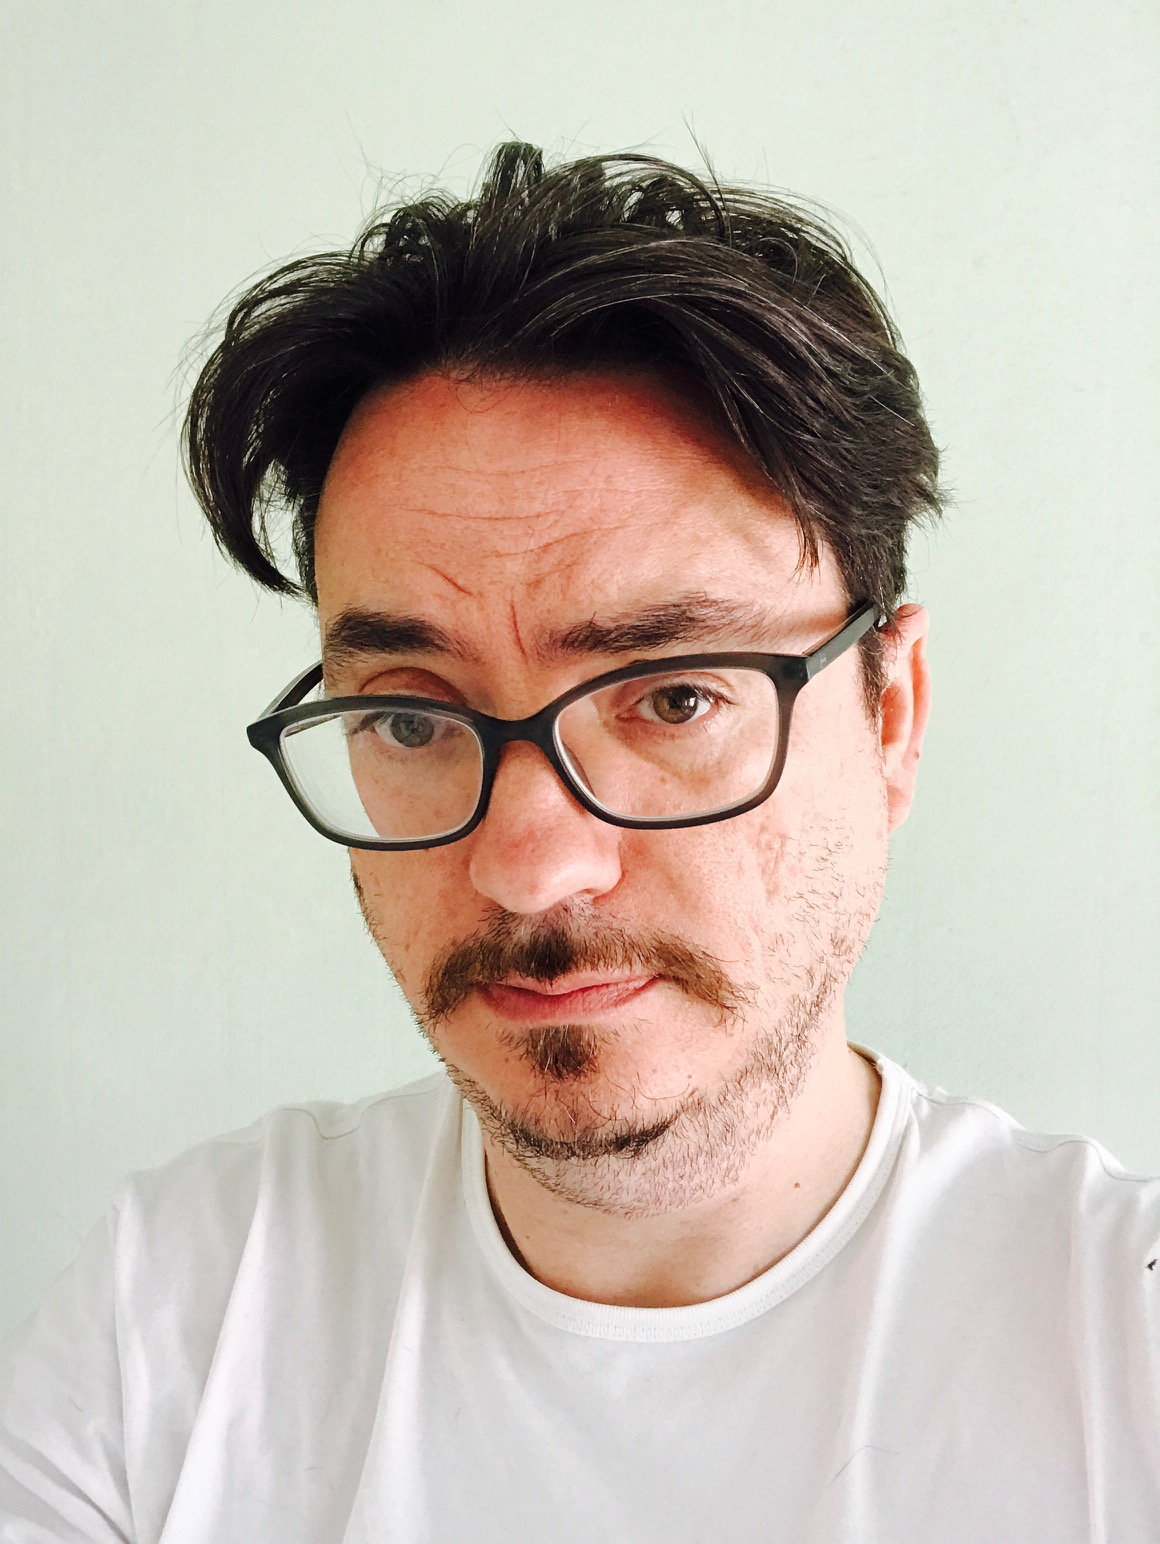 Shaun Lawson — York Mediale